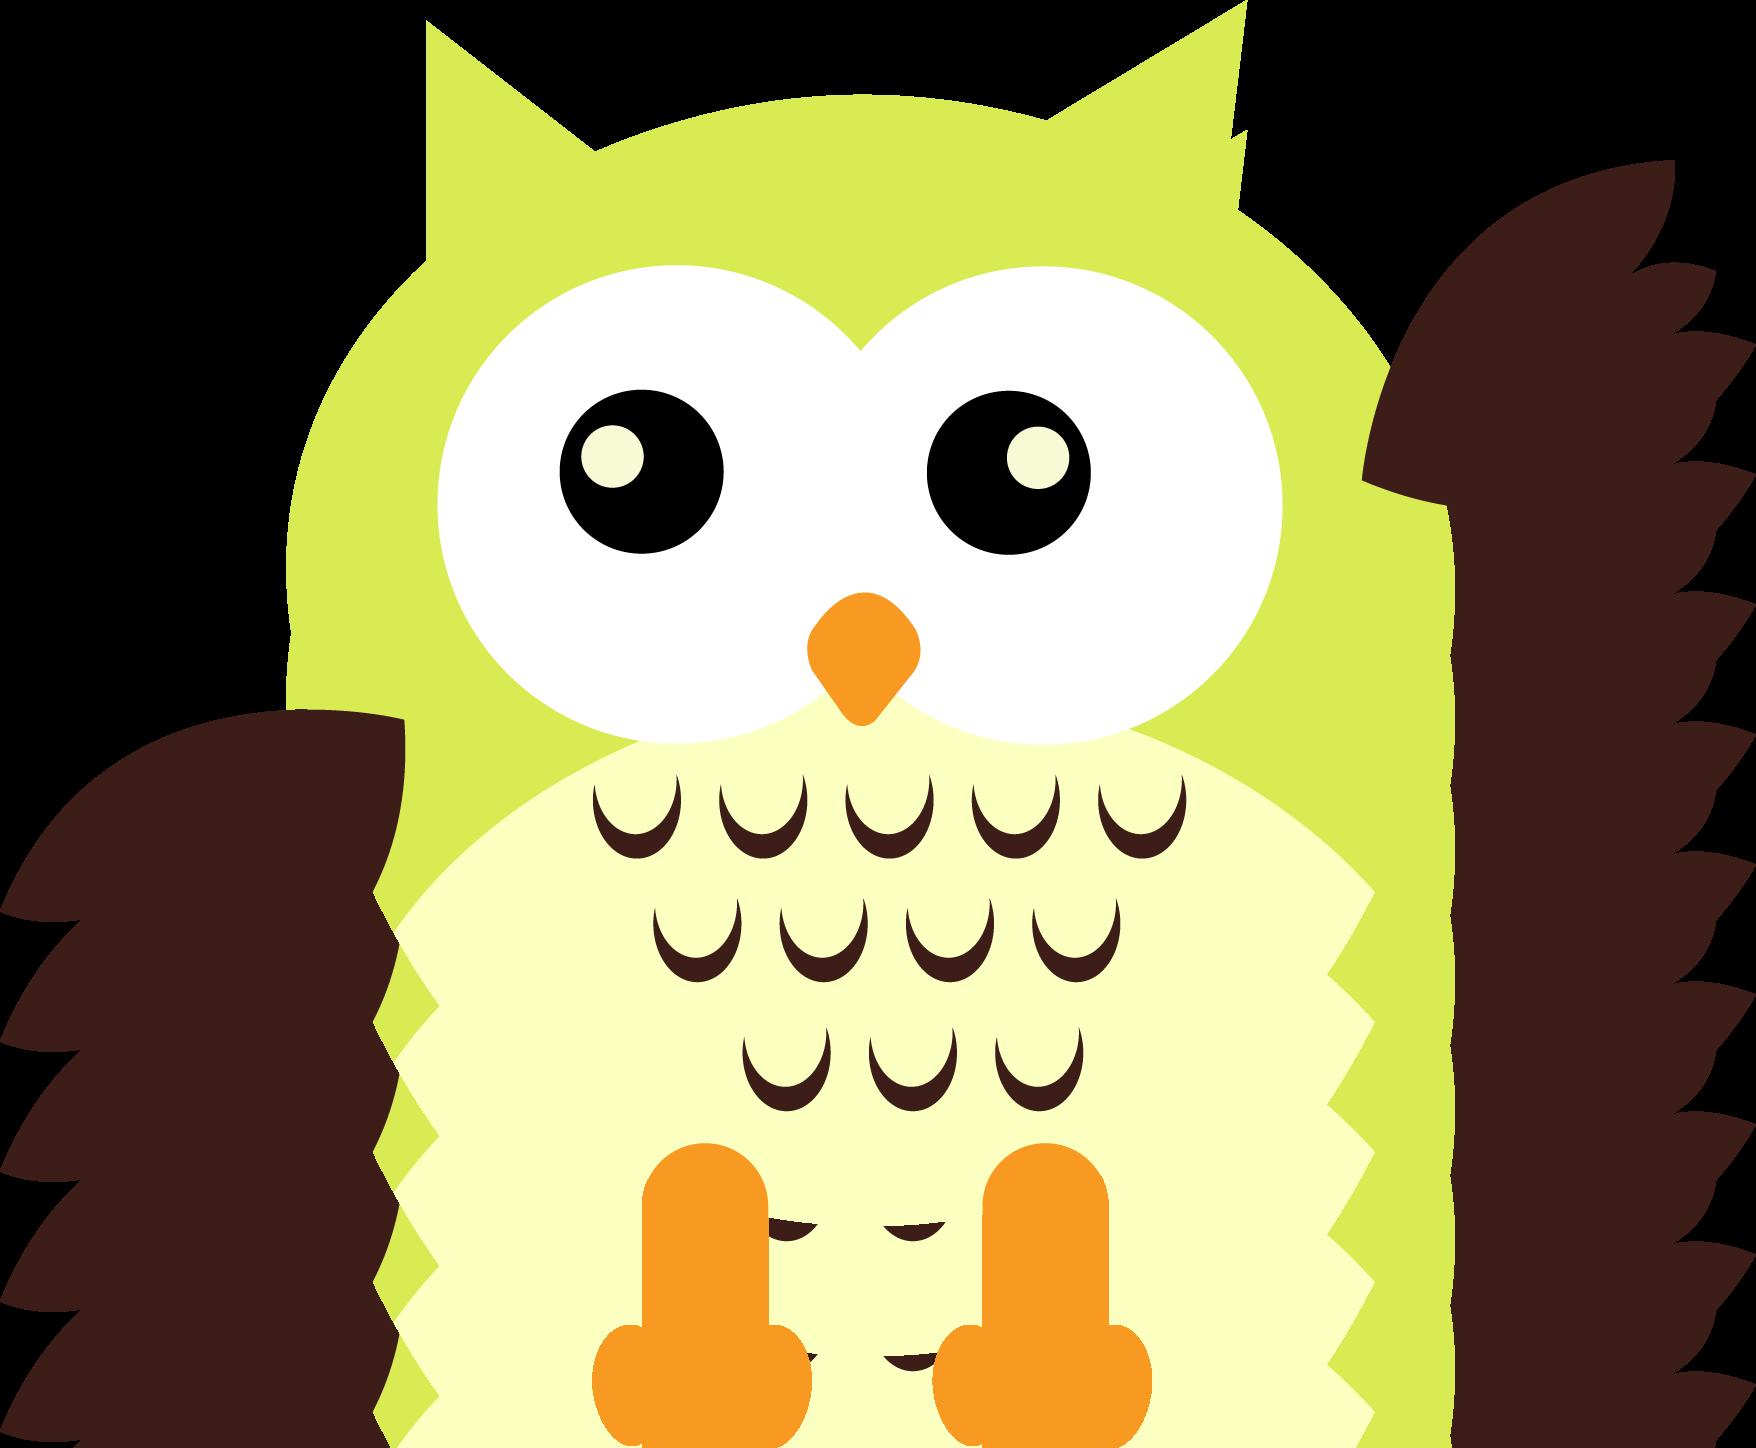 Owls clipart transparent background. Download owl hq png